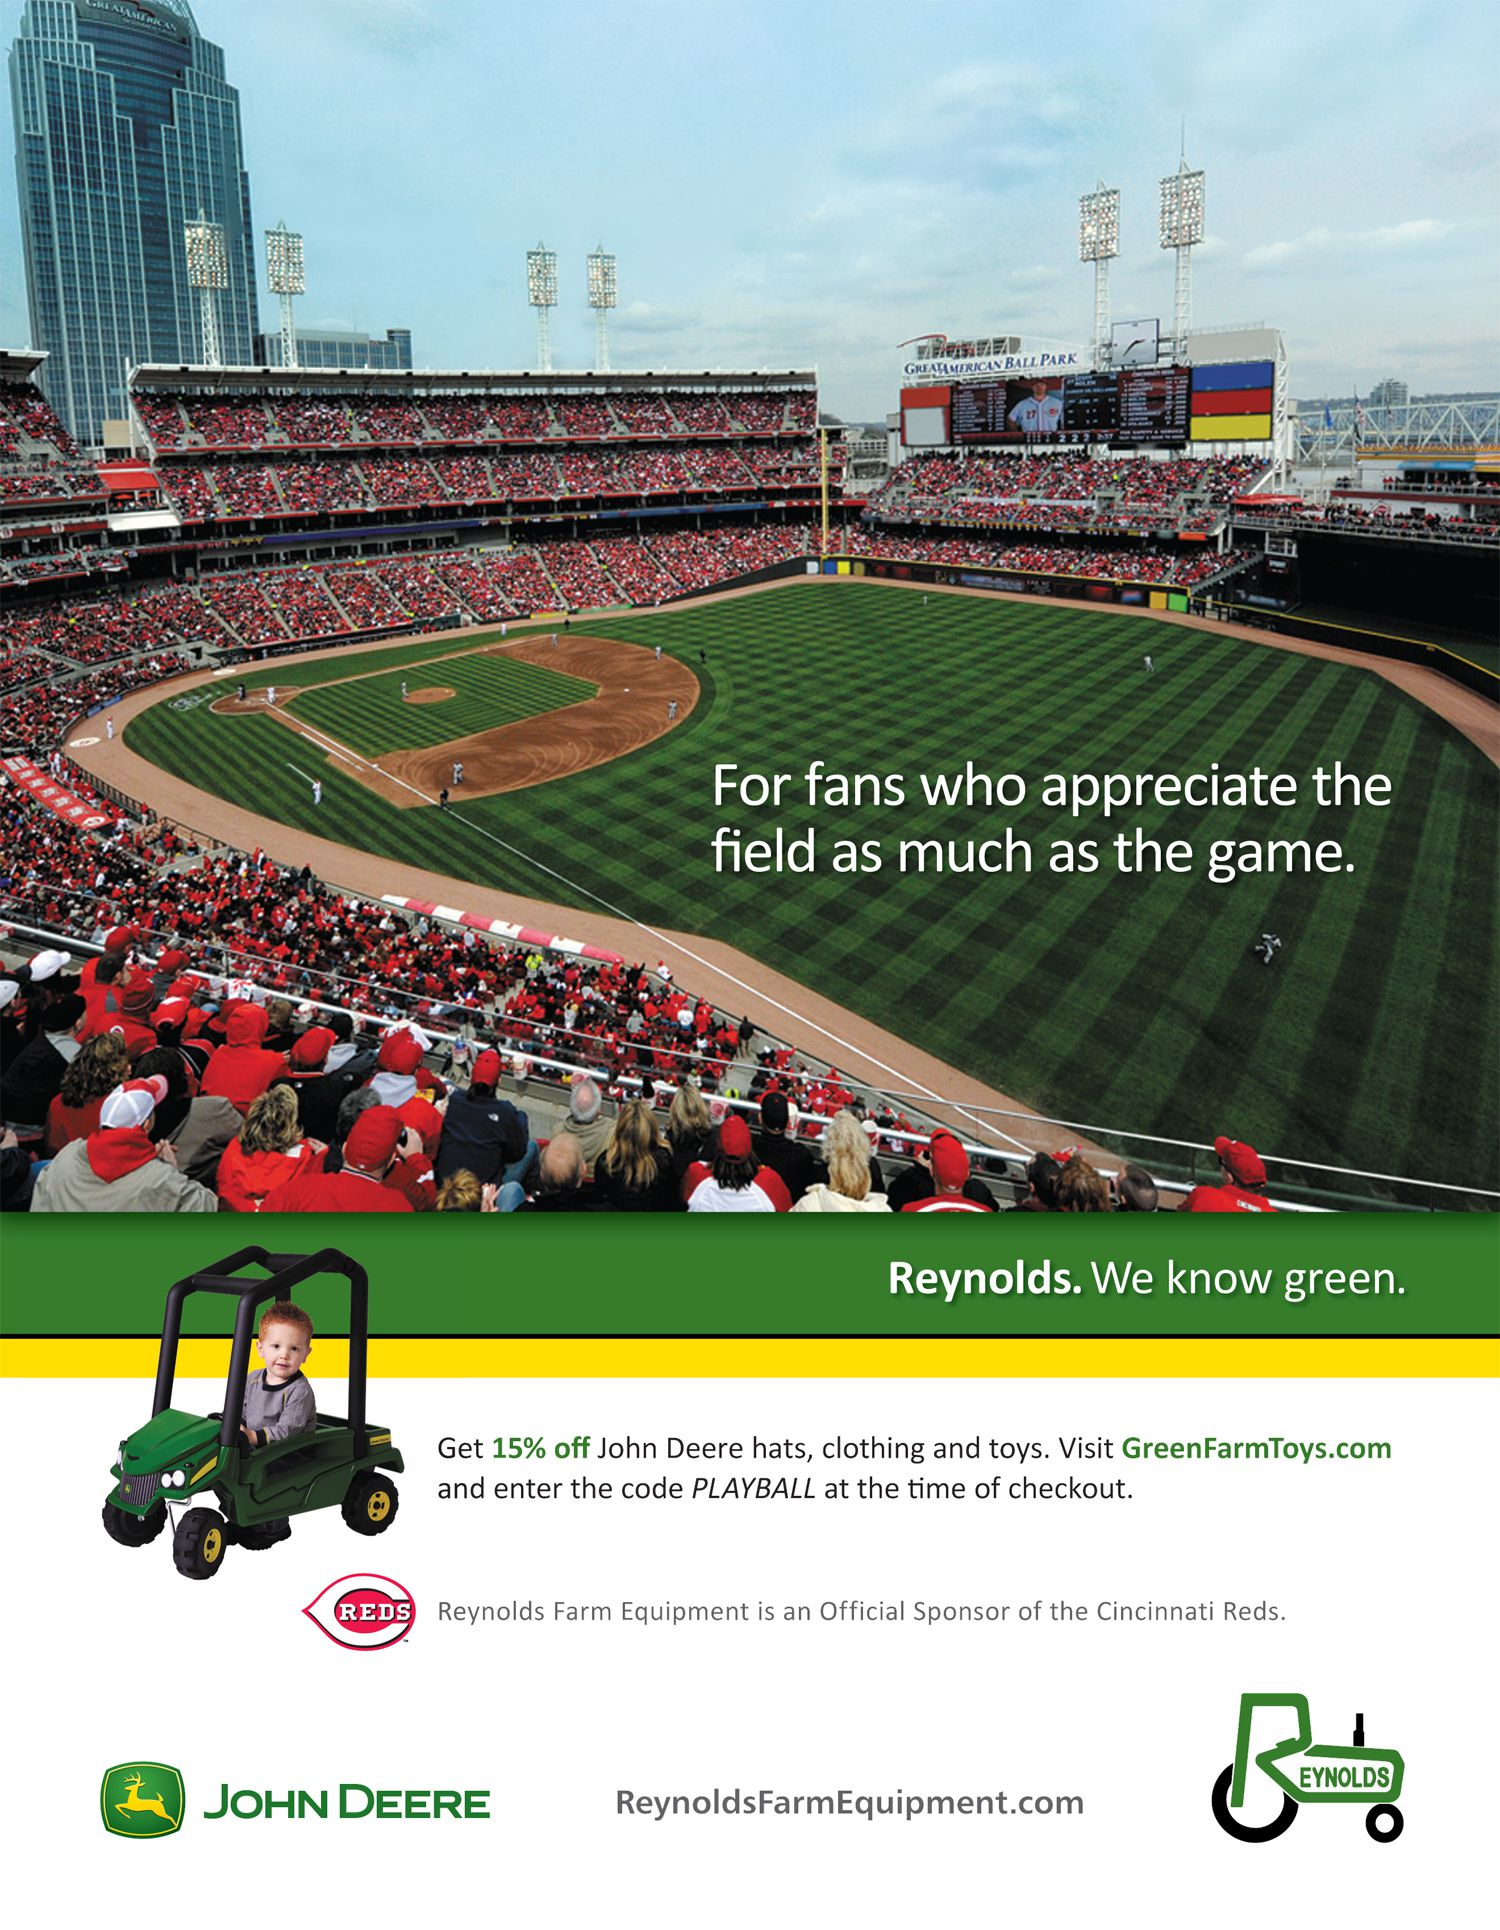 543-the-brand-stewards-Reynolds-Print-Ad.jpg